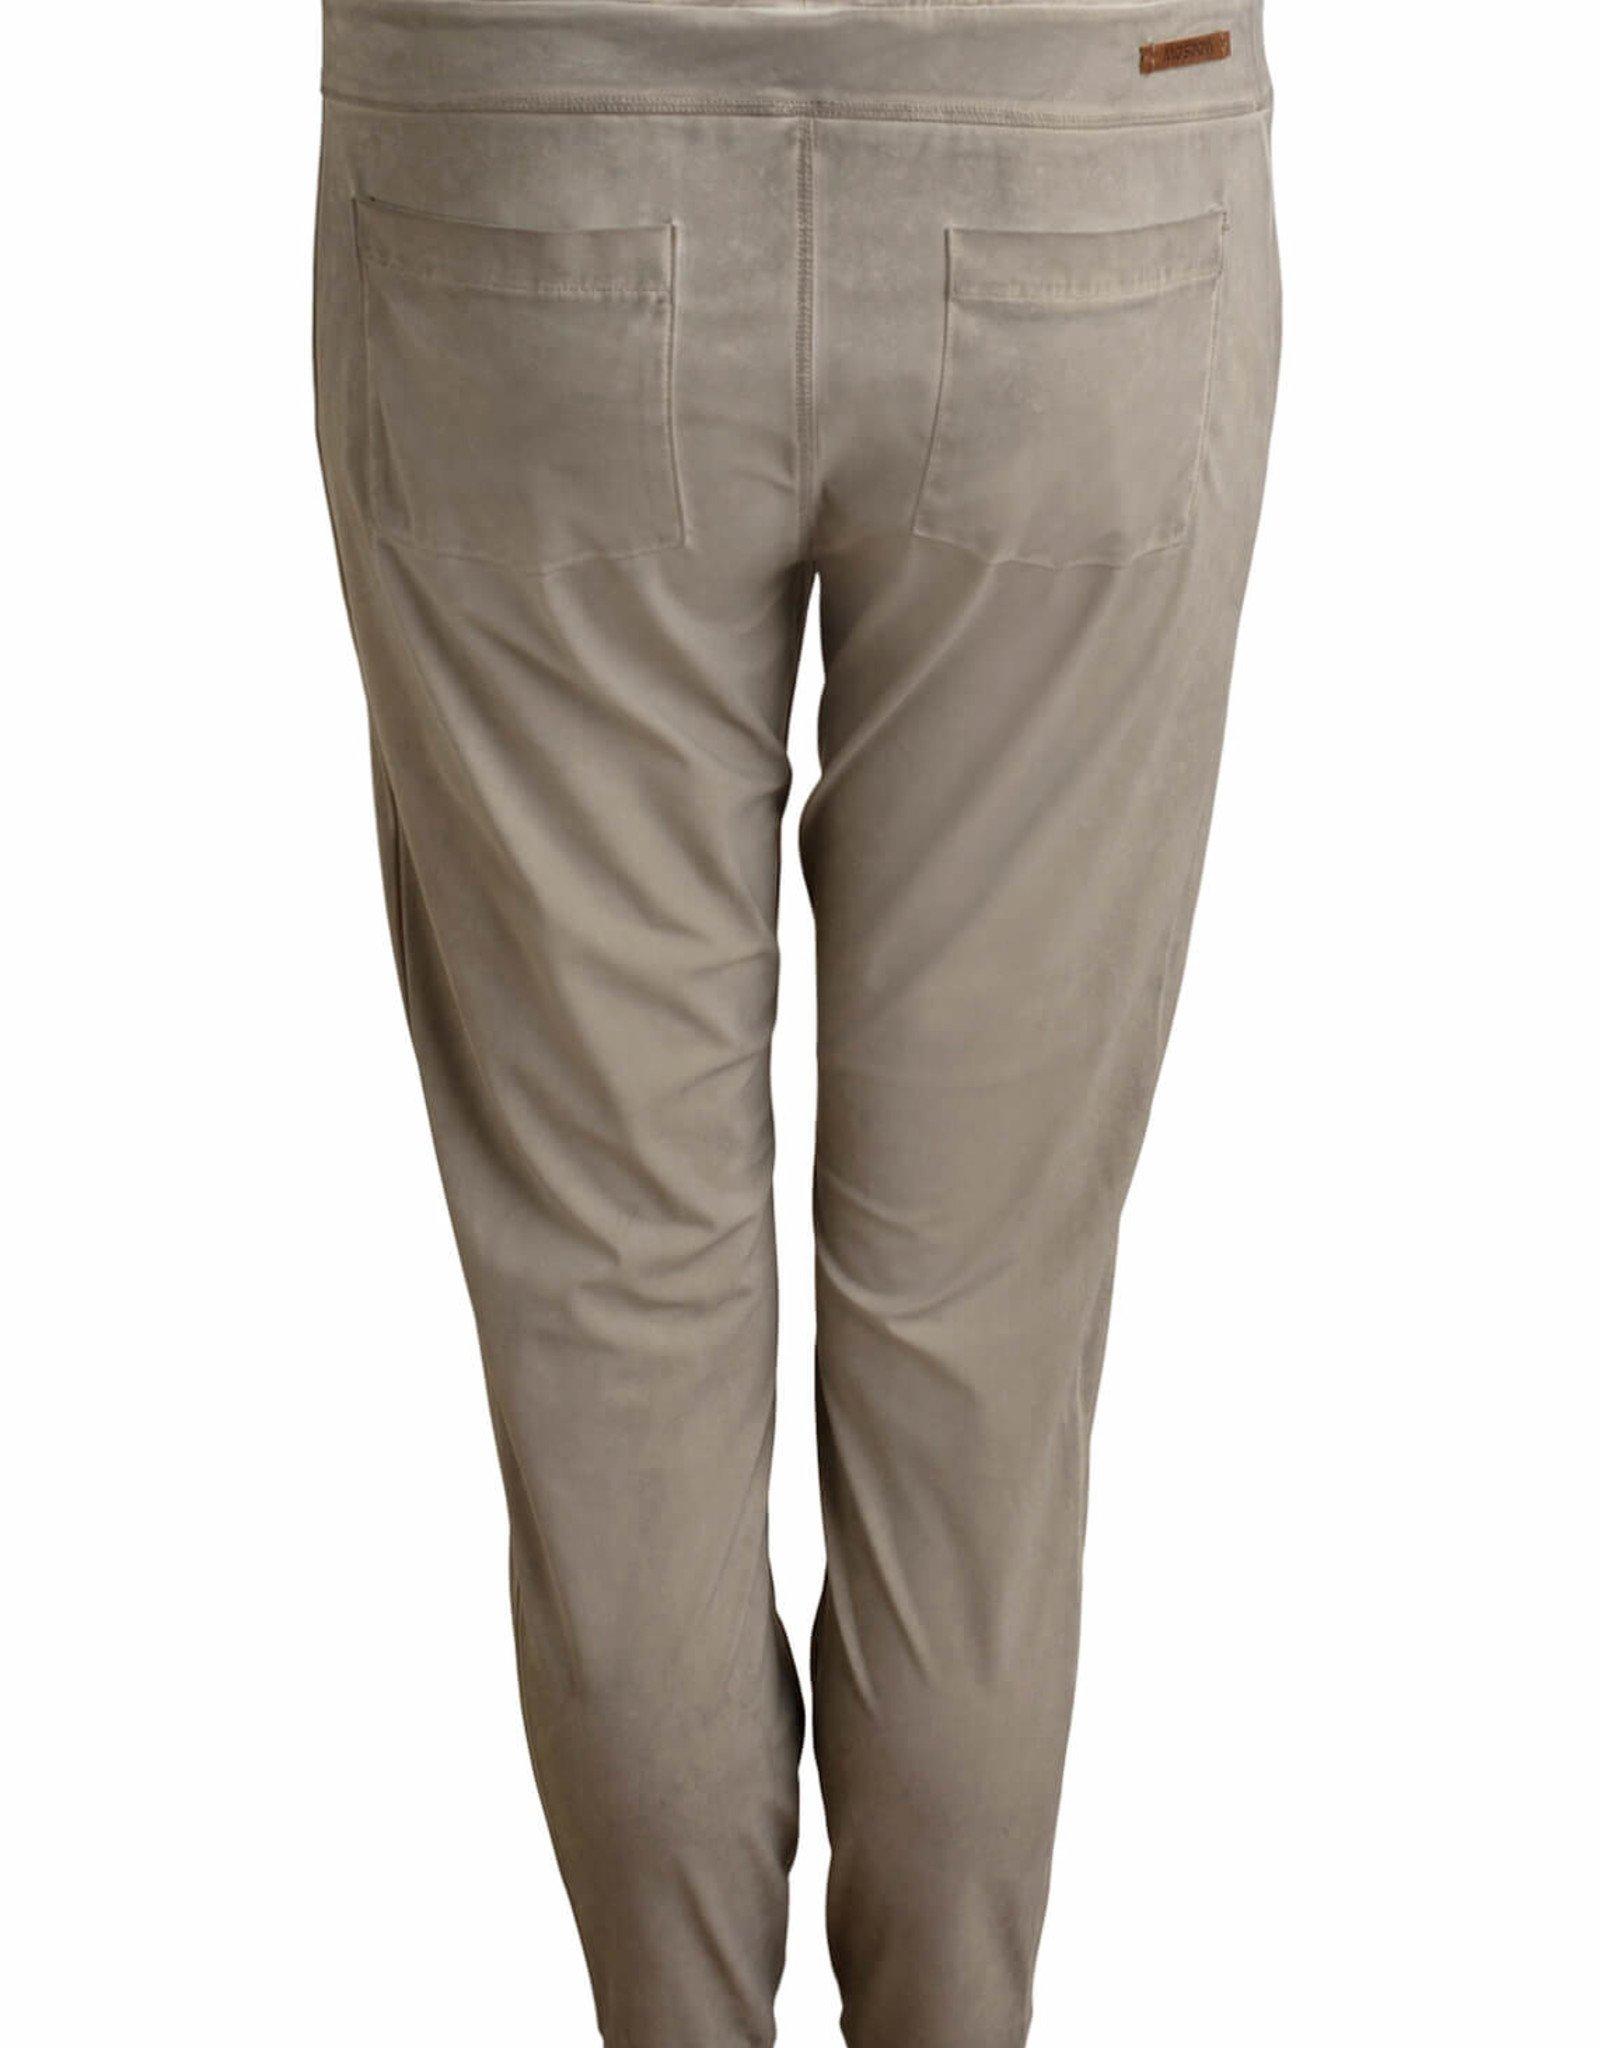 Moscow Pantalon Taupe